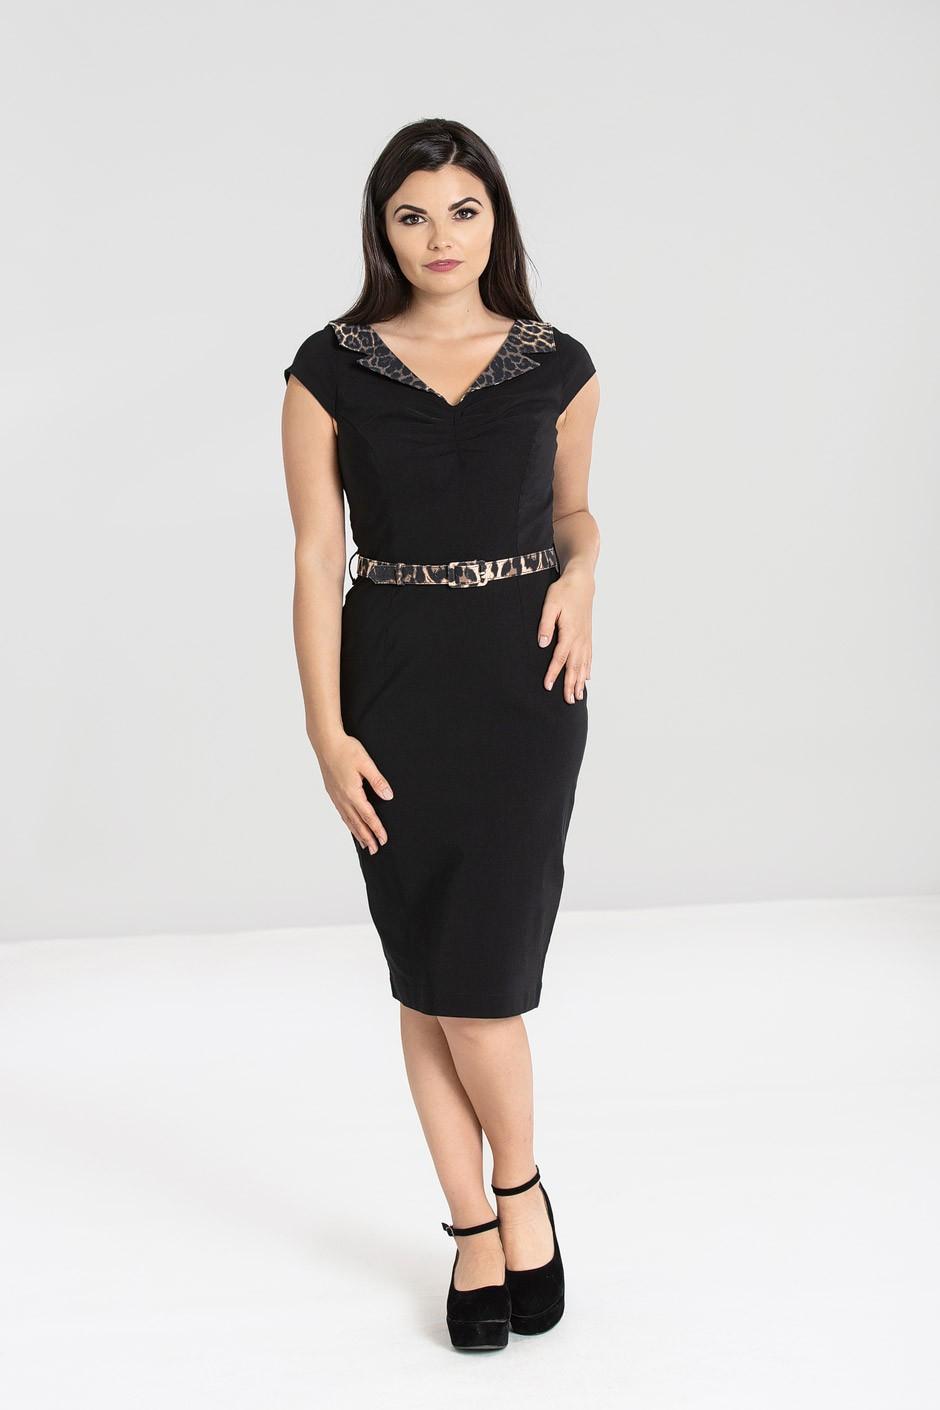 77e6b05c0cf70b Fabulous boutique : Retro kledij , handtassen en accesoires in forties en  fifties style, pin-up en rockabilly style | Fabulous Boutique